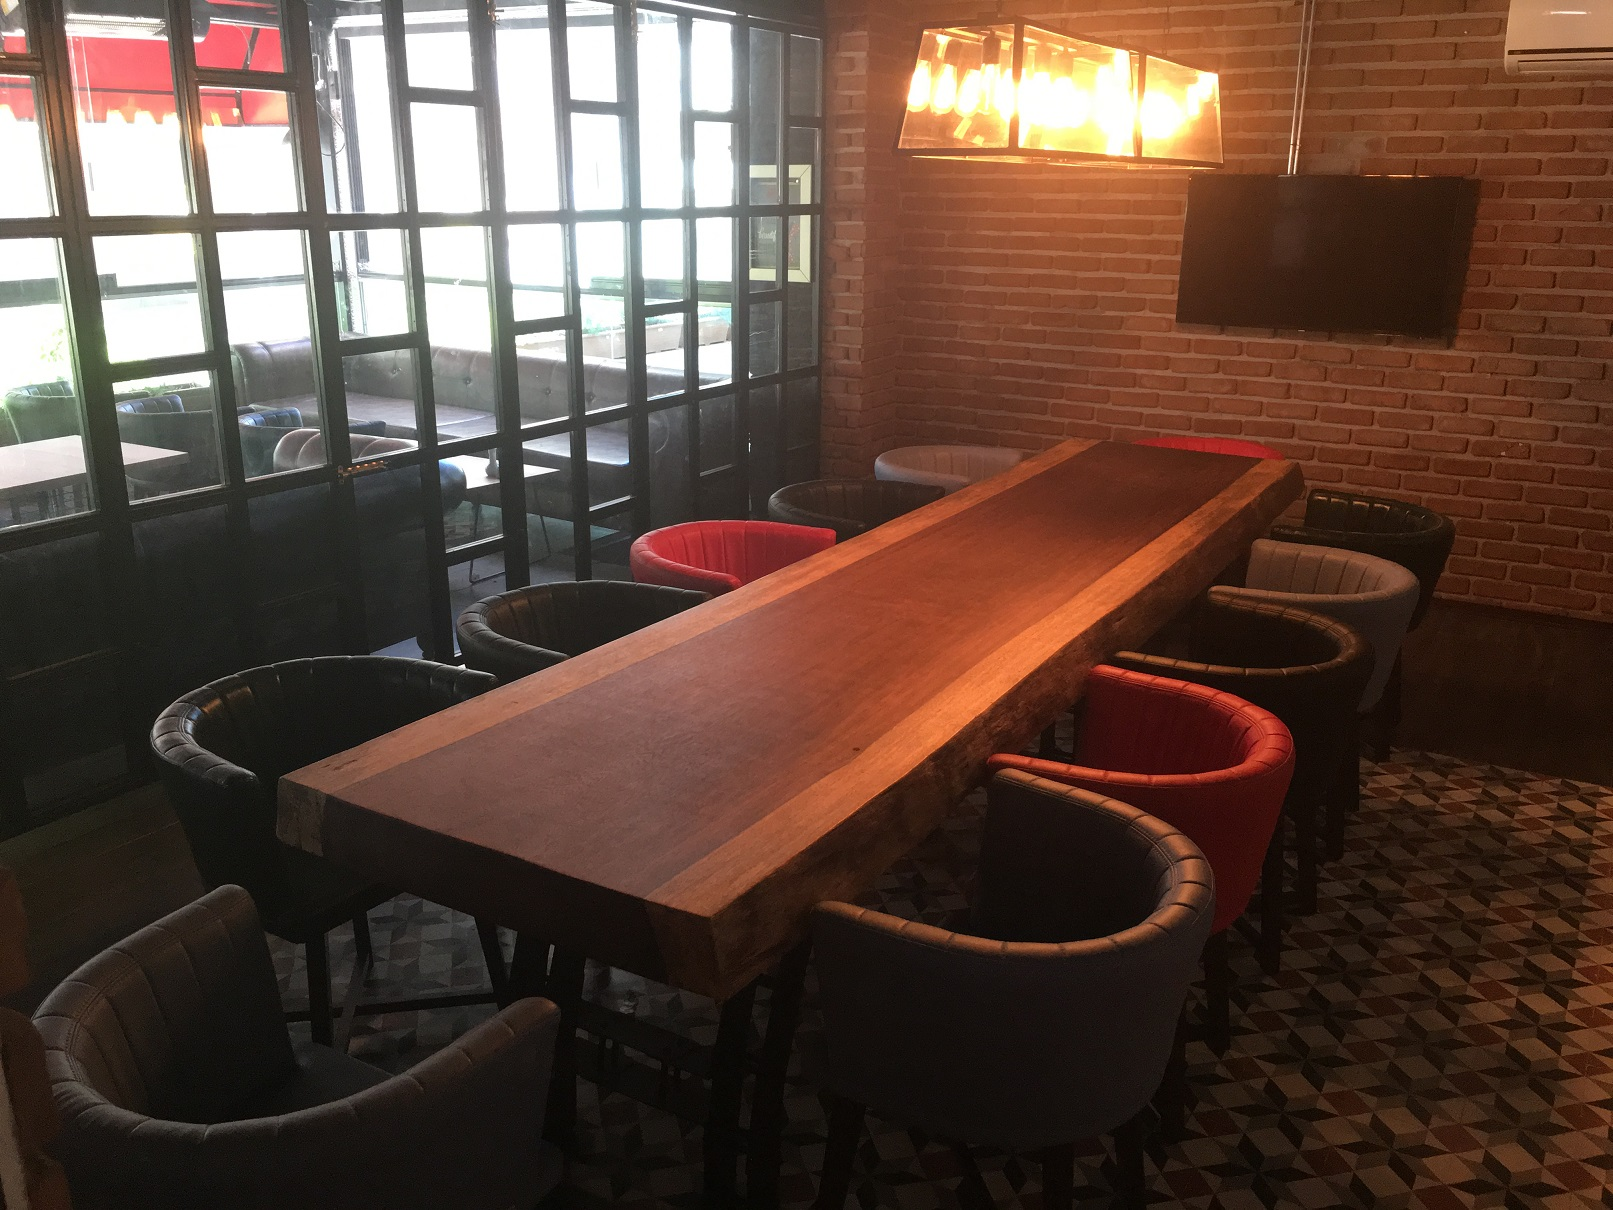 Tischplatte holz natur  Epoxidharz | Massivholzmöbel | Epoxyresin | Dastek GmbH | Solingen